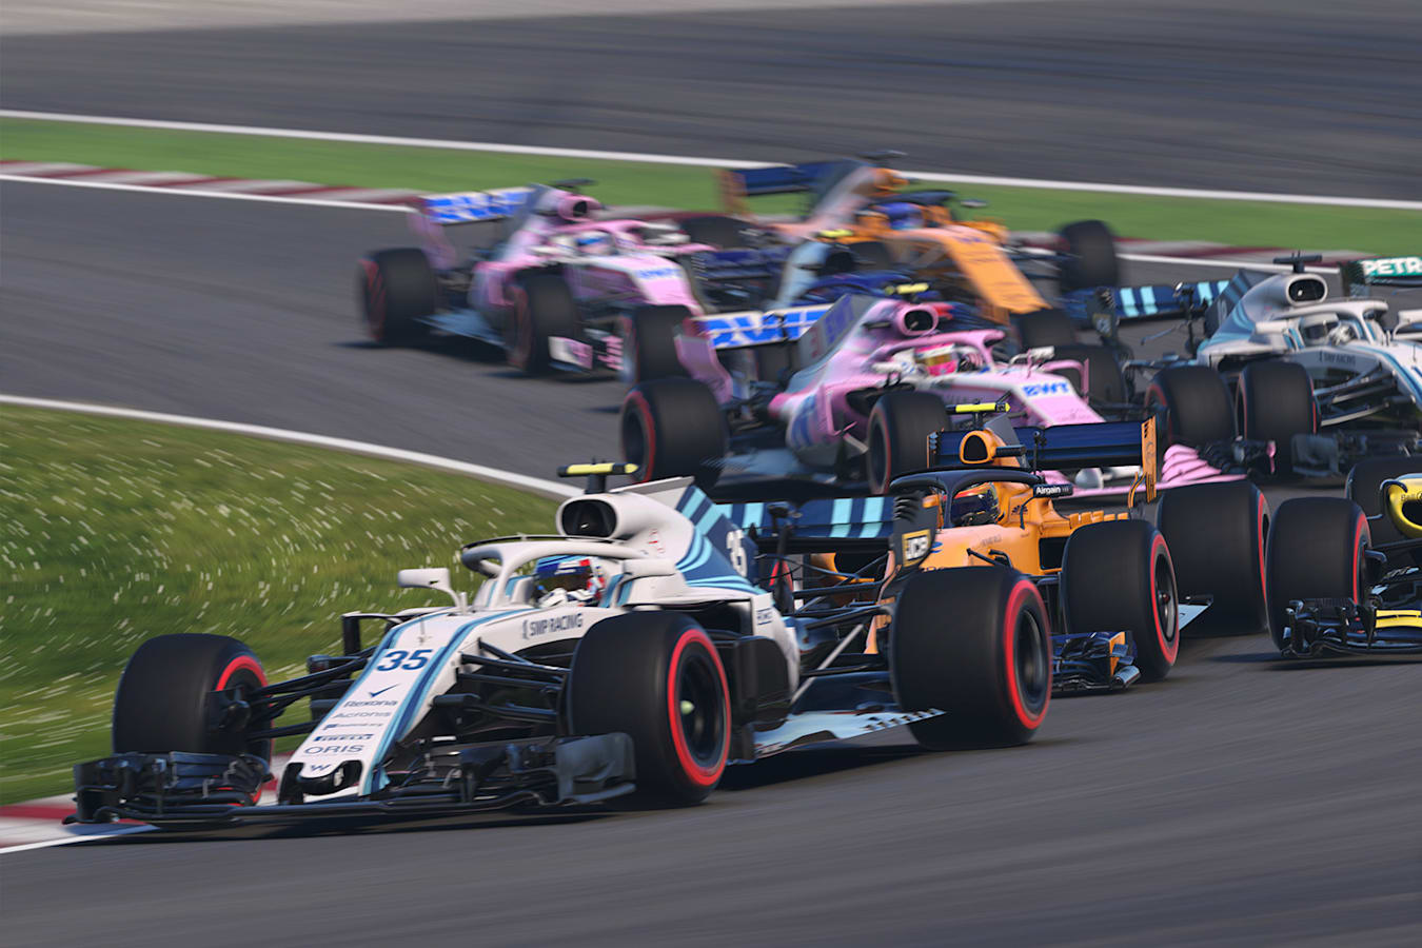 F 1 2018 Cars Jpg